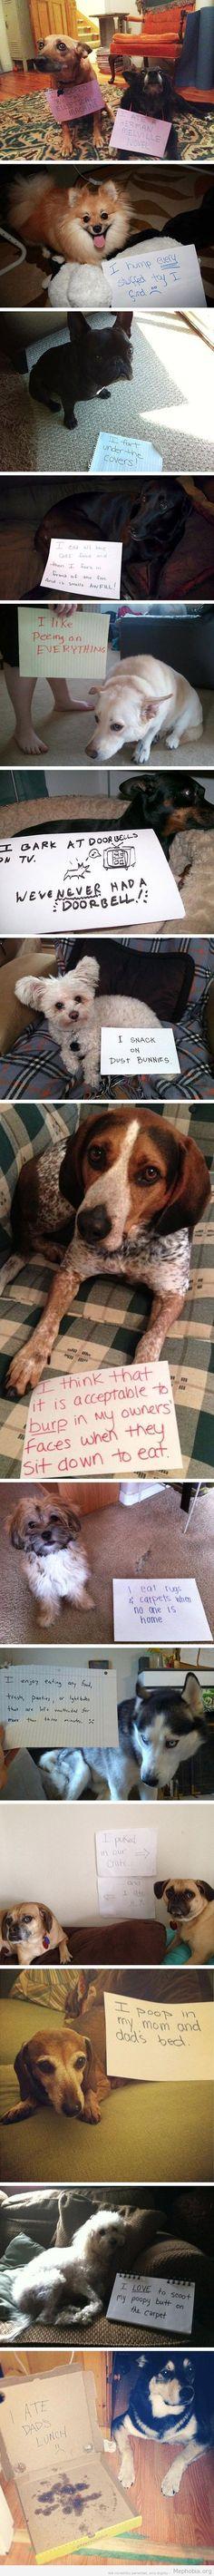 Bad Dog! lol